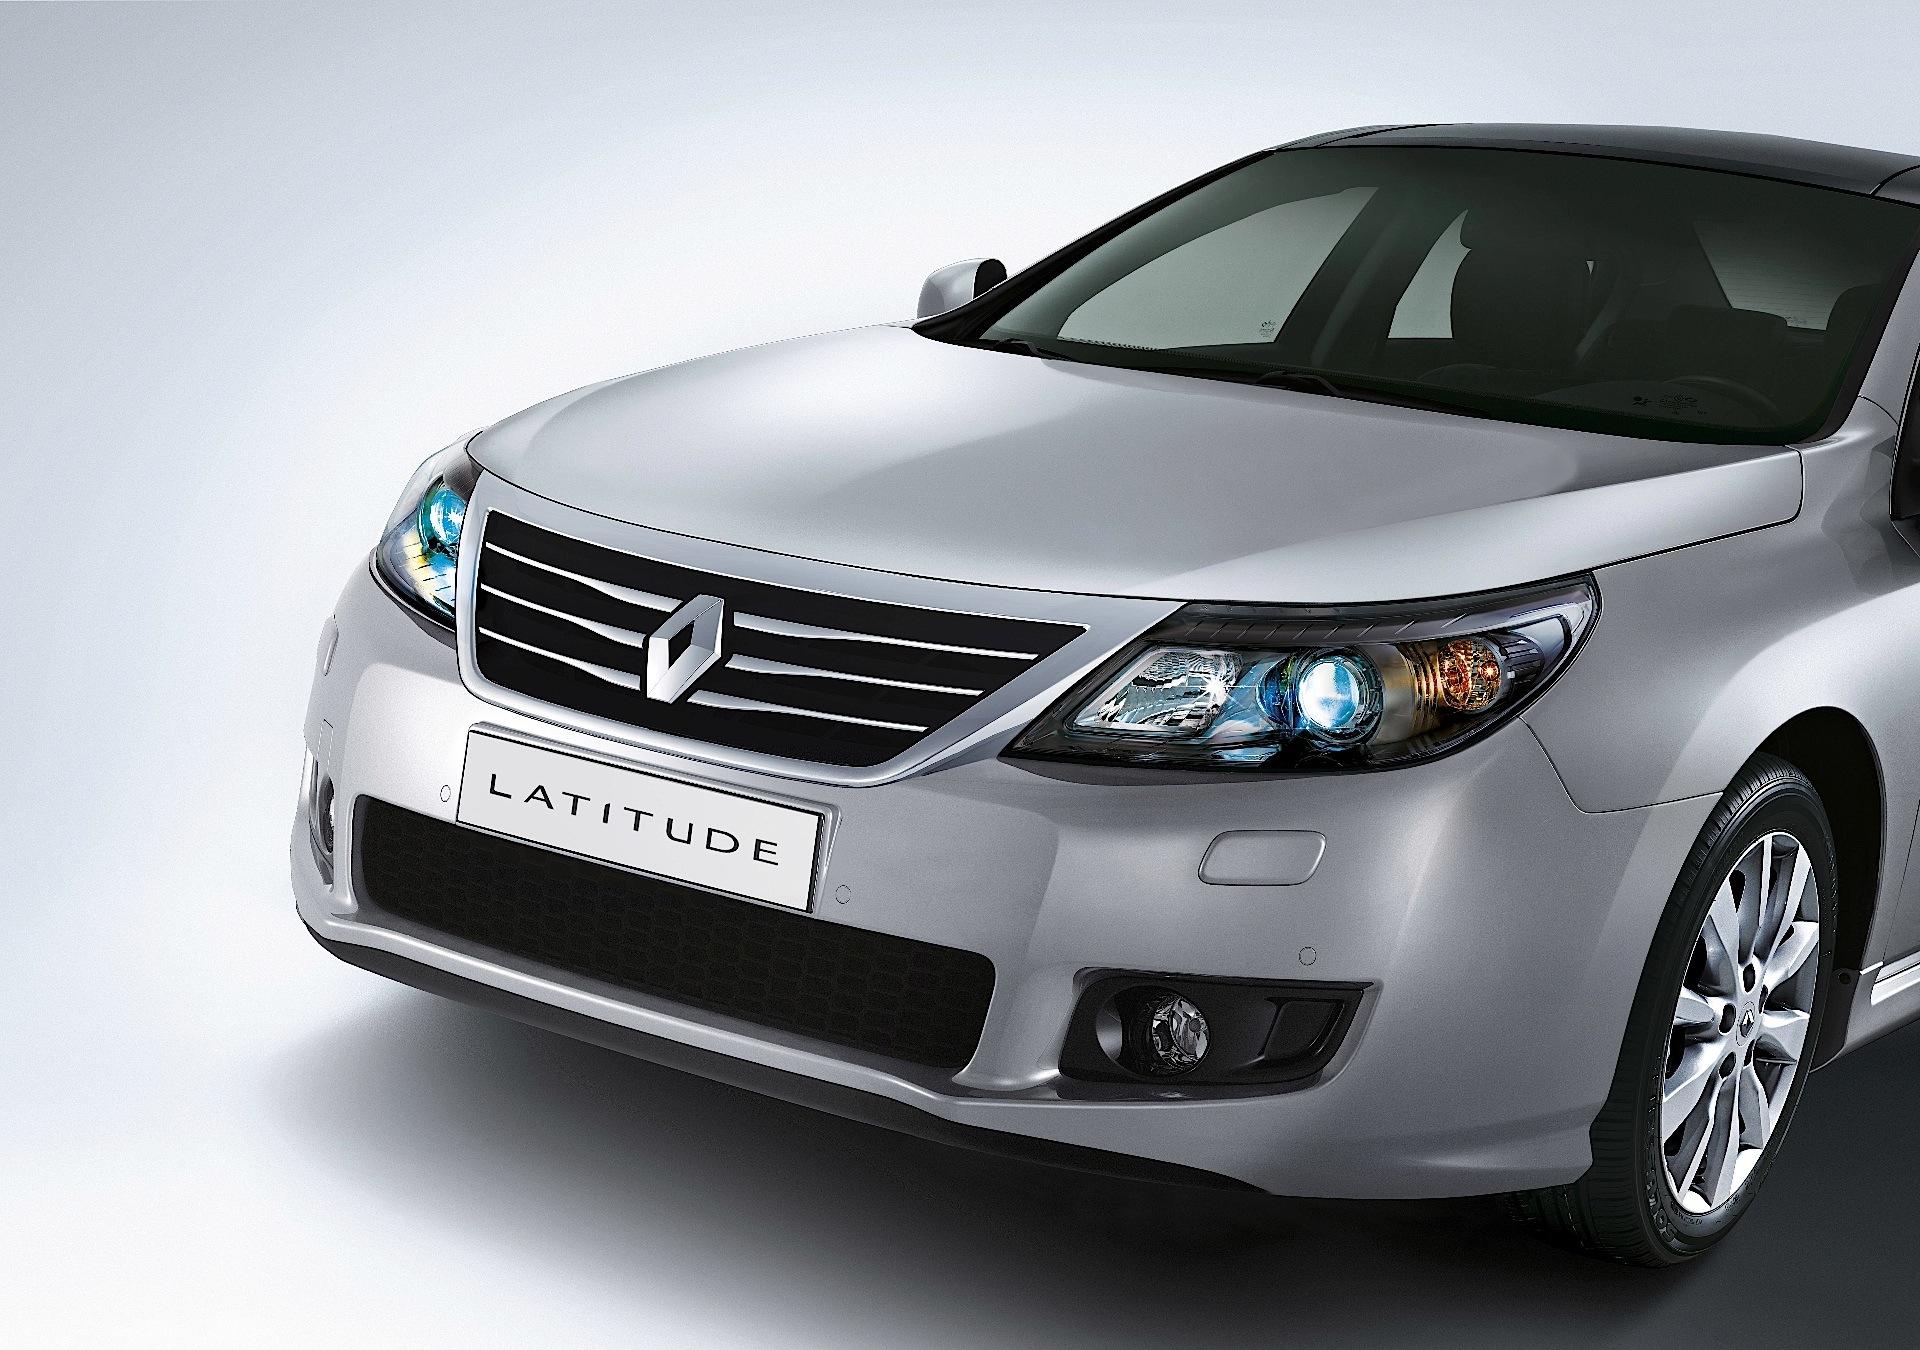 Renault latitude 2016